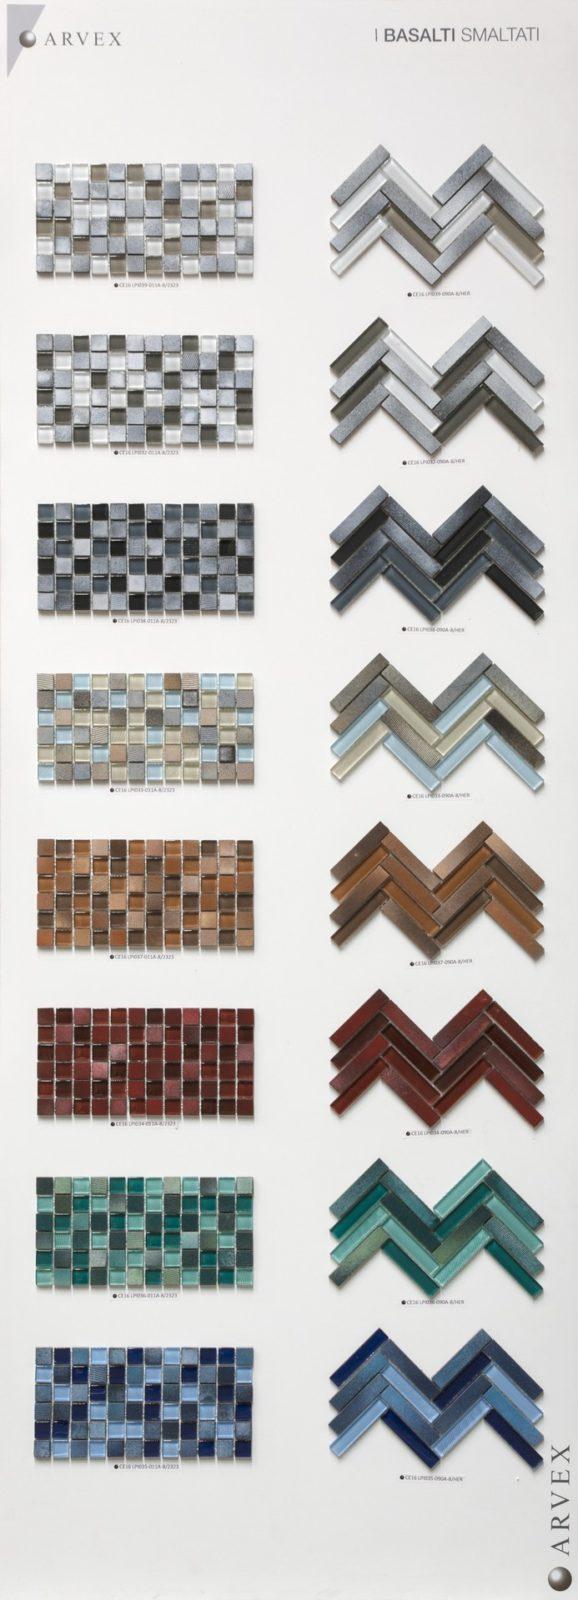 Mosaico - I Basalti Smaltati 02